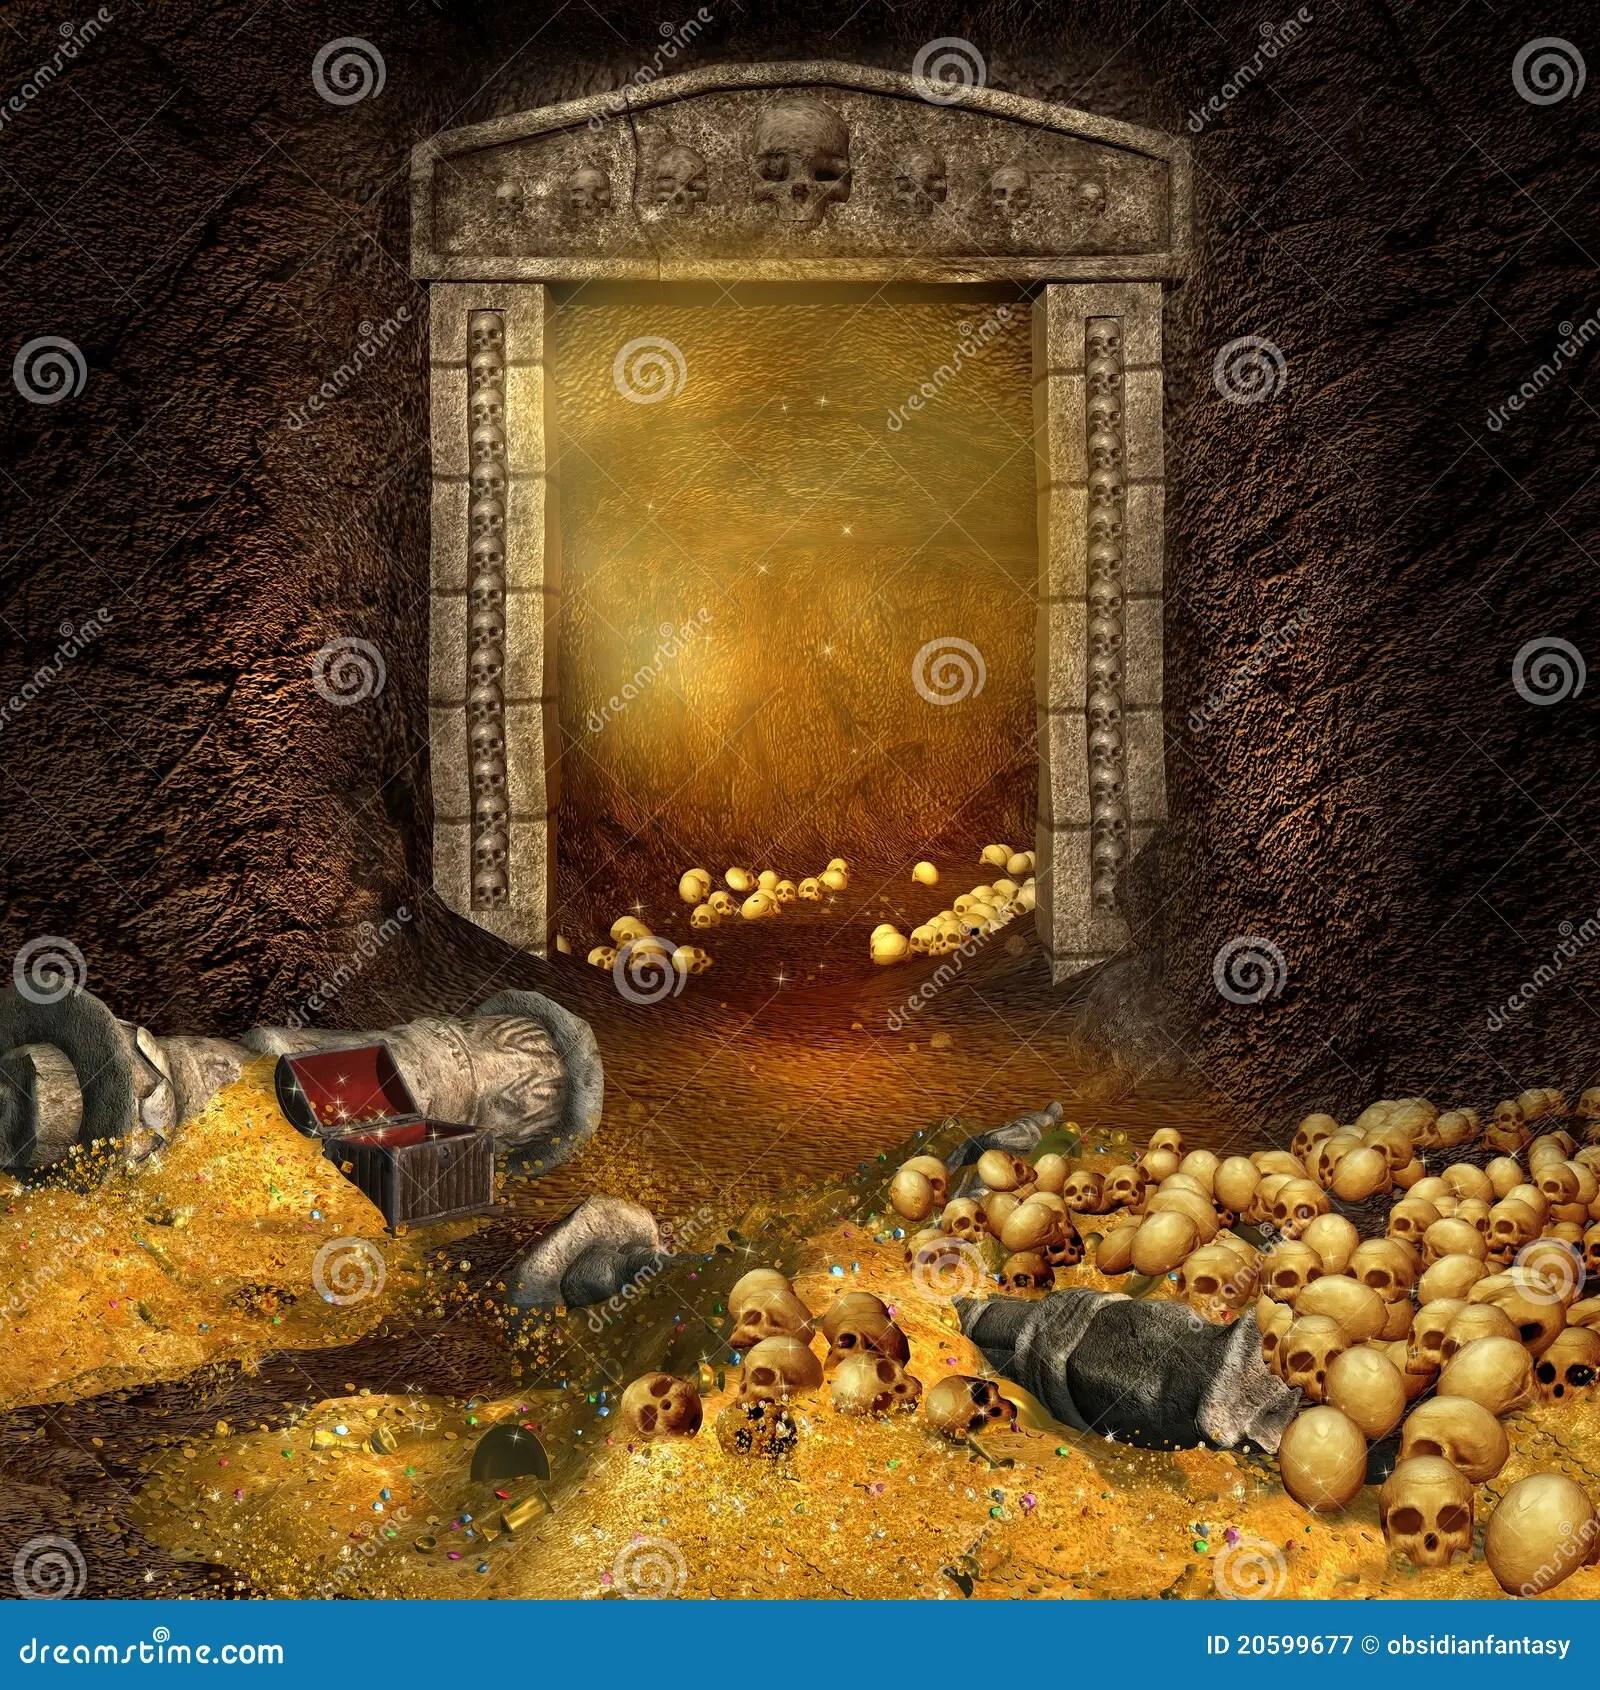 Royalty Free Stock Photography Treasure Cave